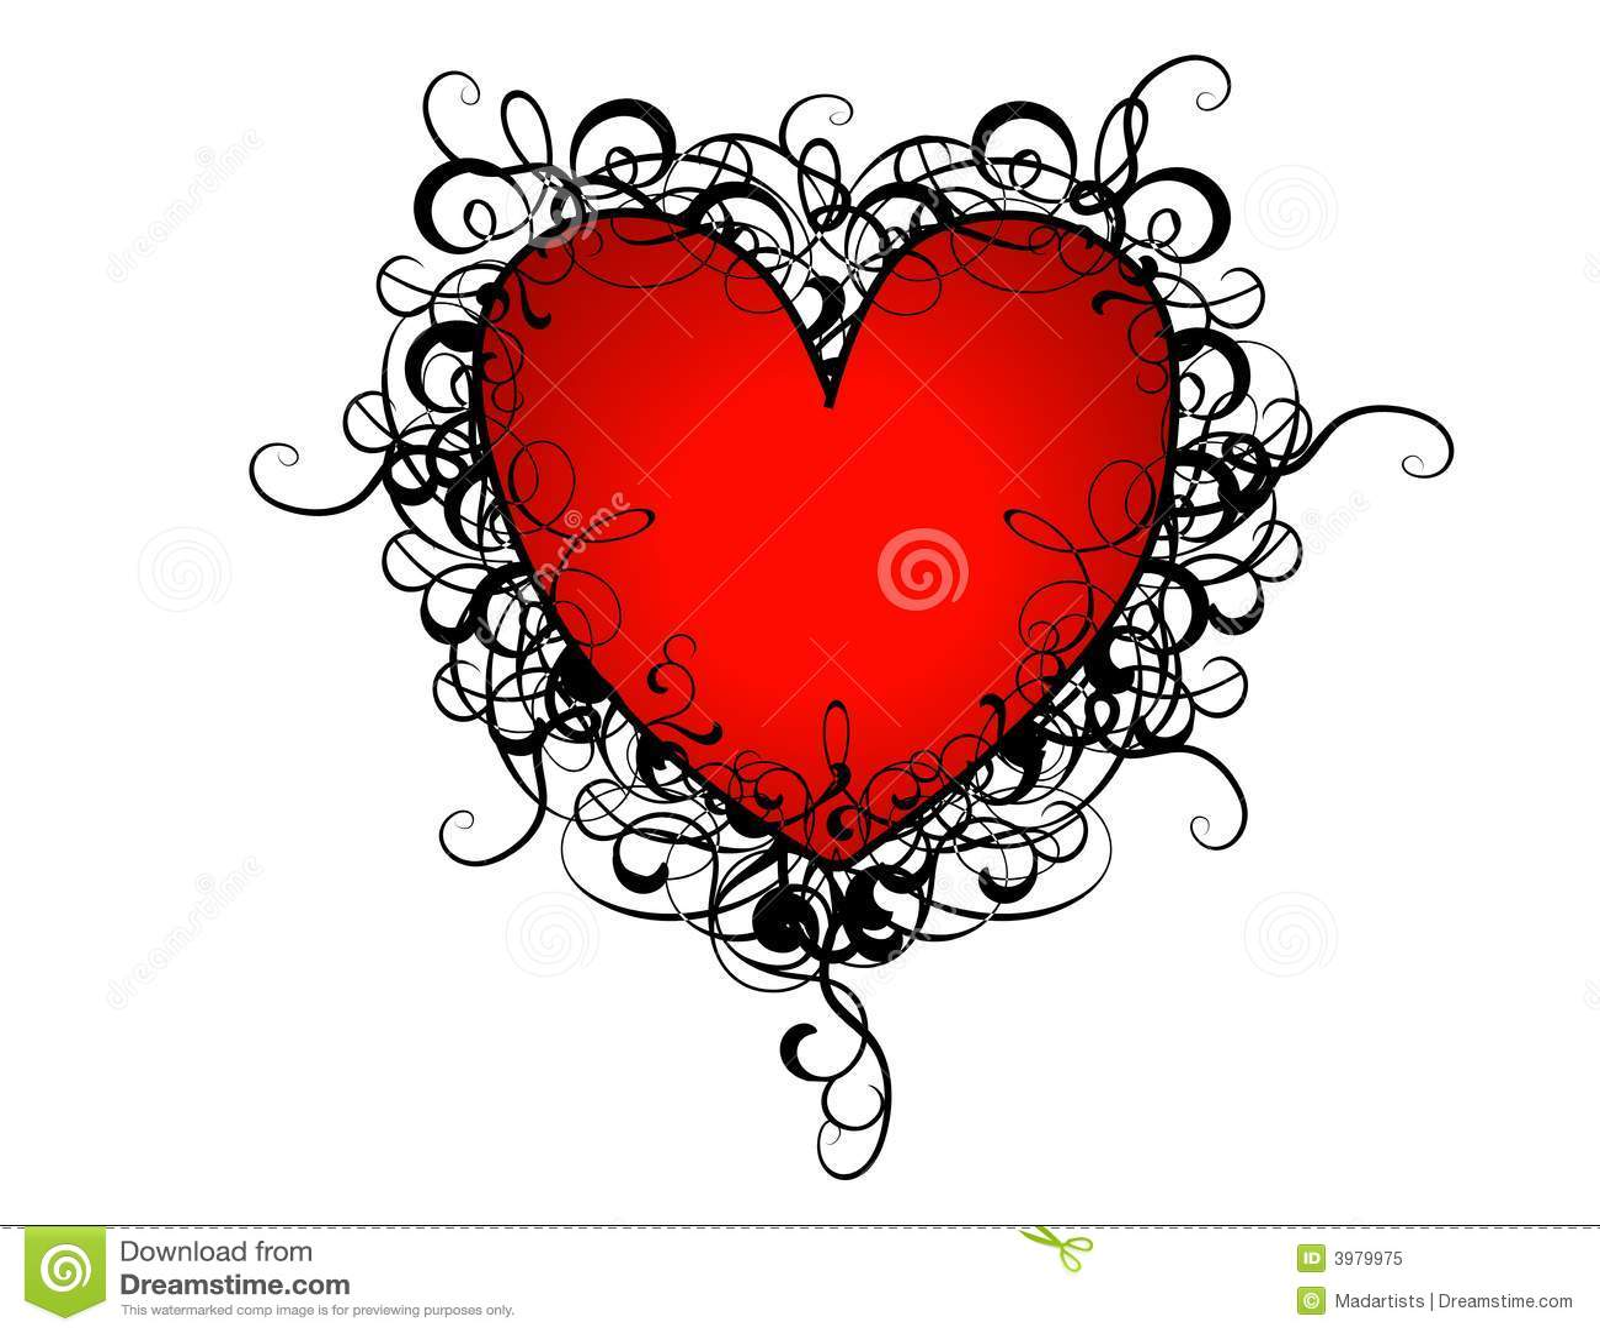 Heart Swirl Design Clip Art A clip art illustration